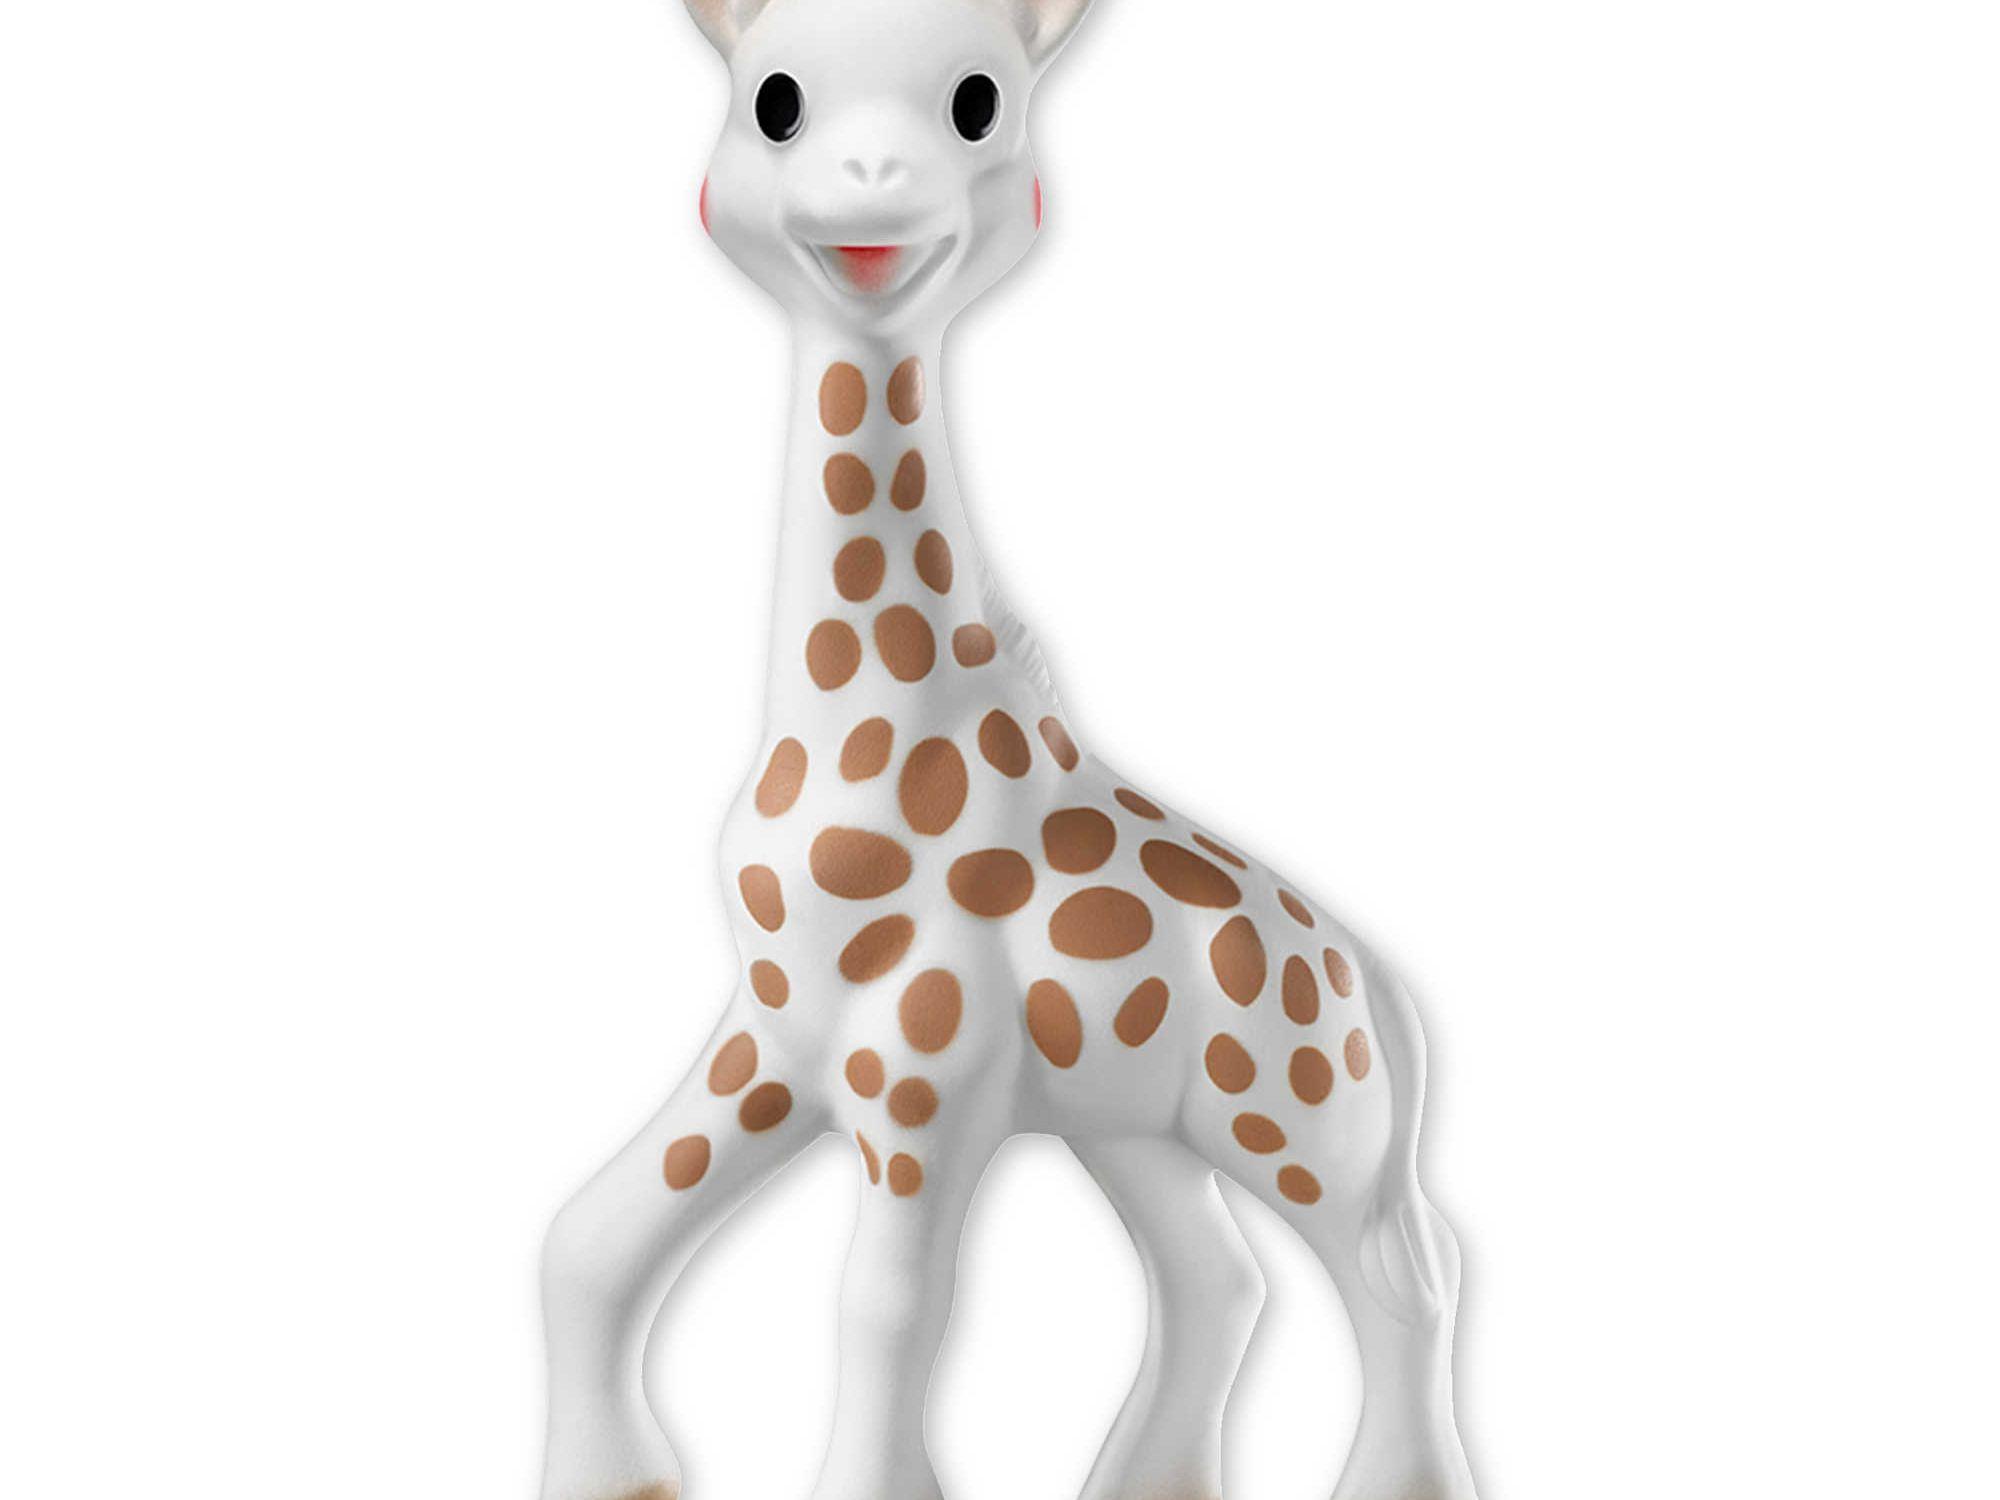 Cartoon Giraffe Shape Baby Teether Silicone BPA Free Teething Toy Necklace